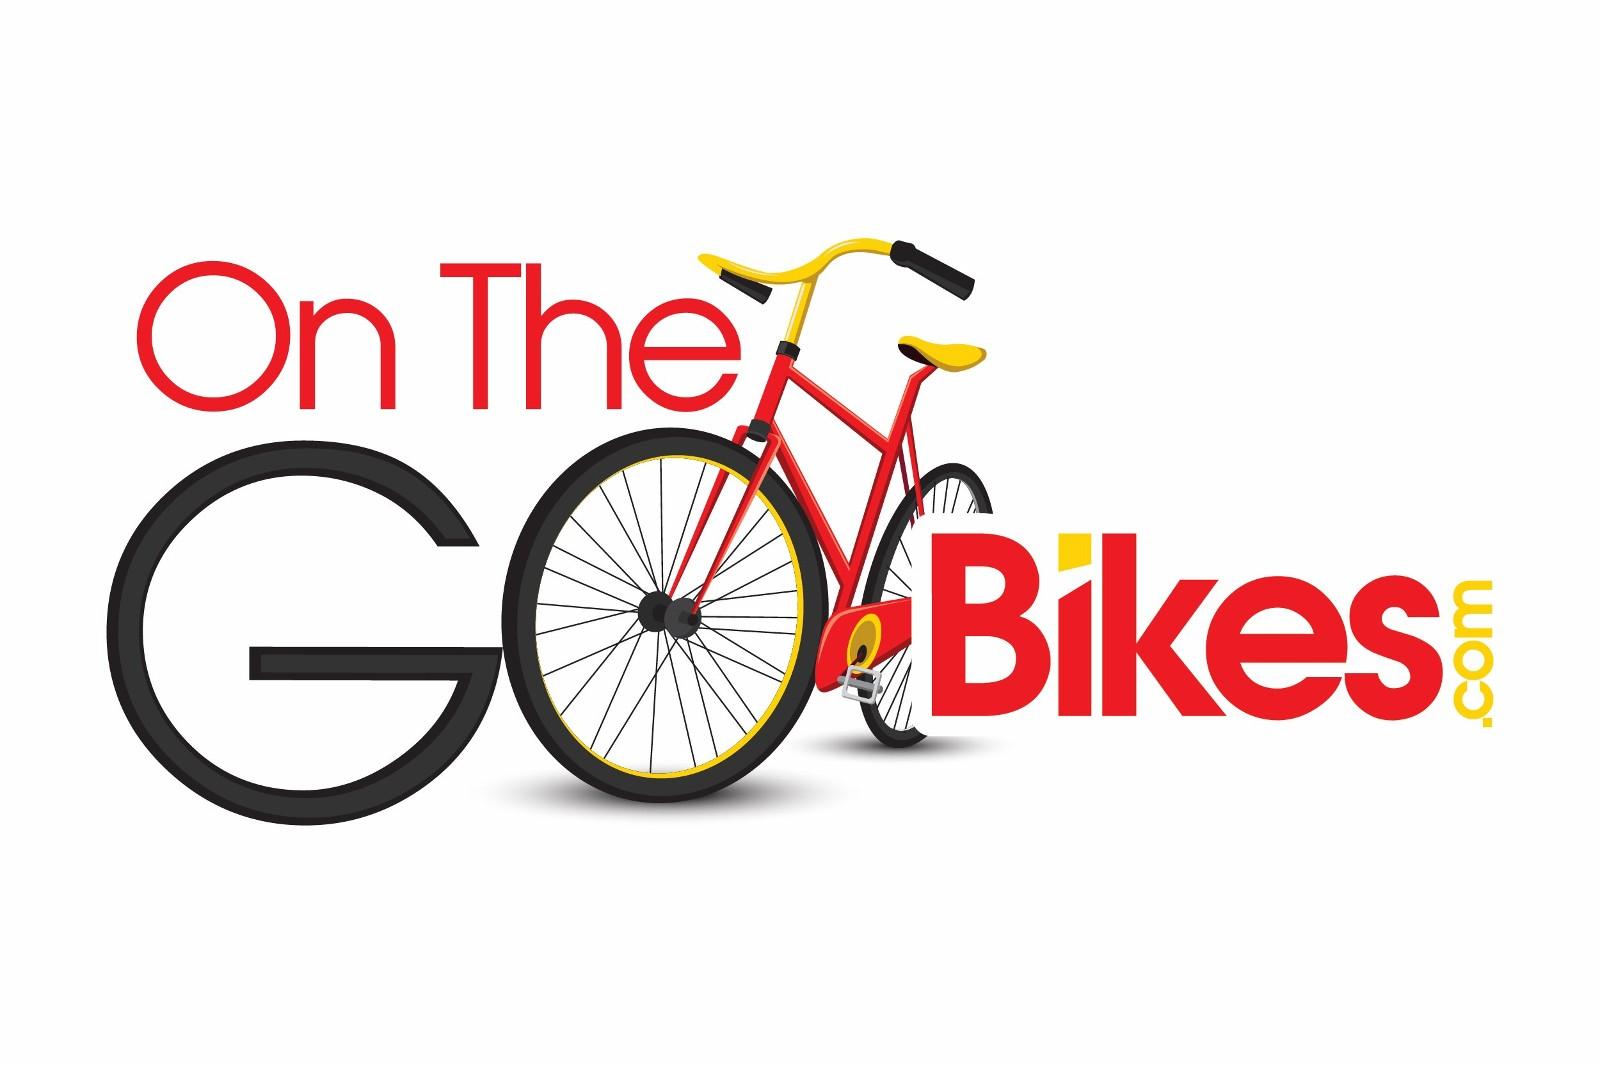 On the Go Bikes